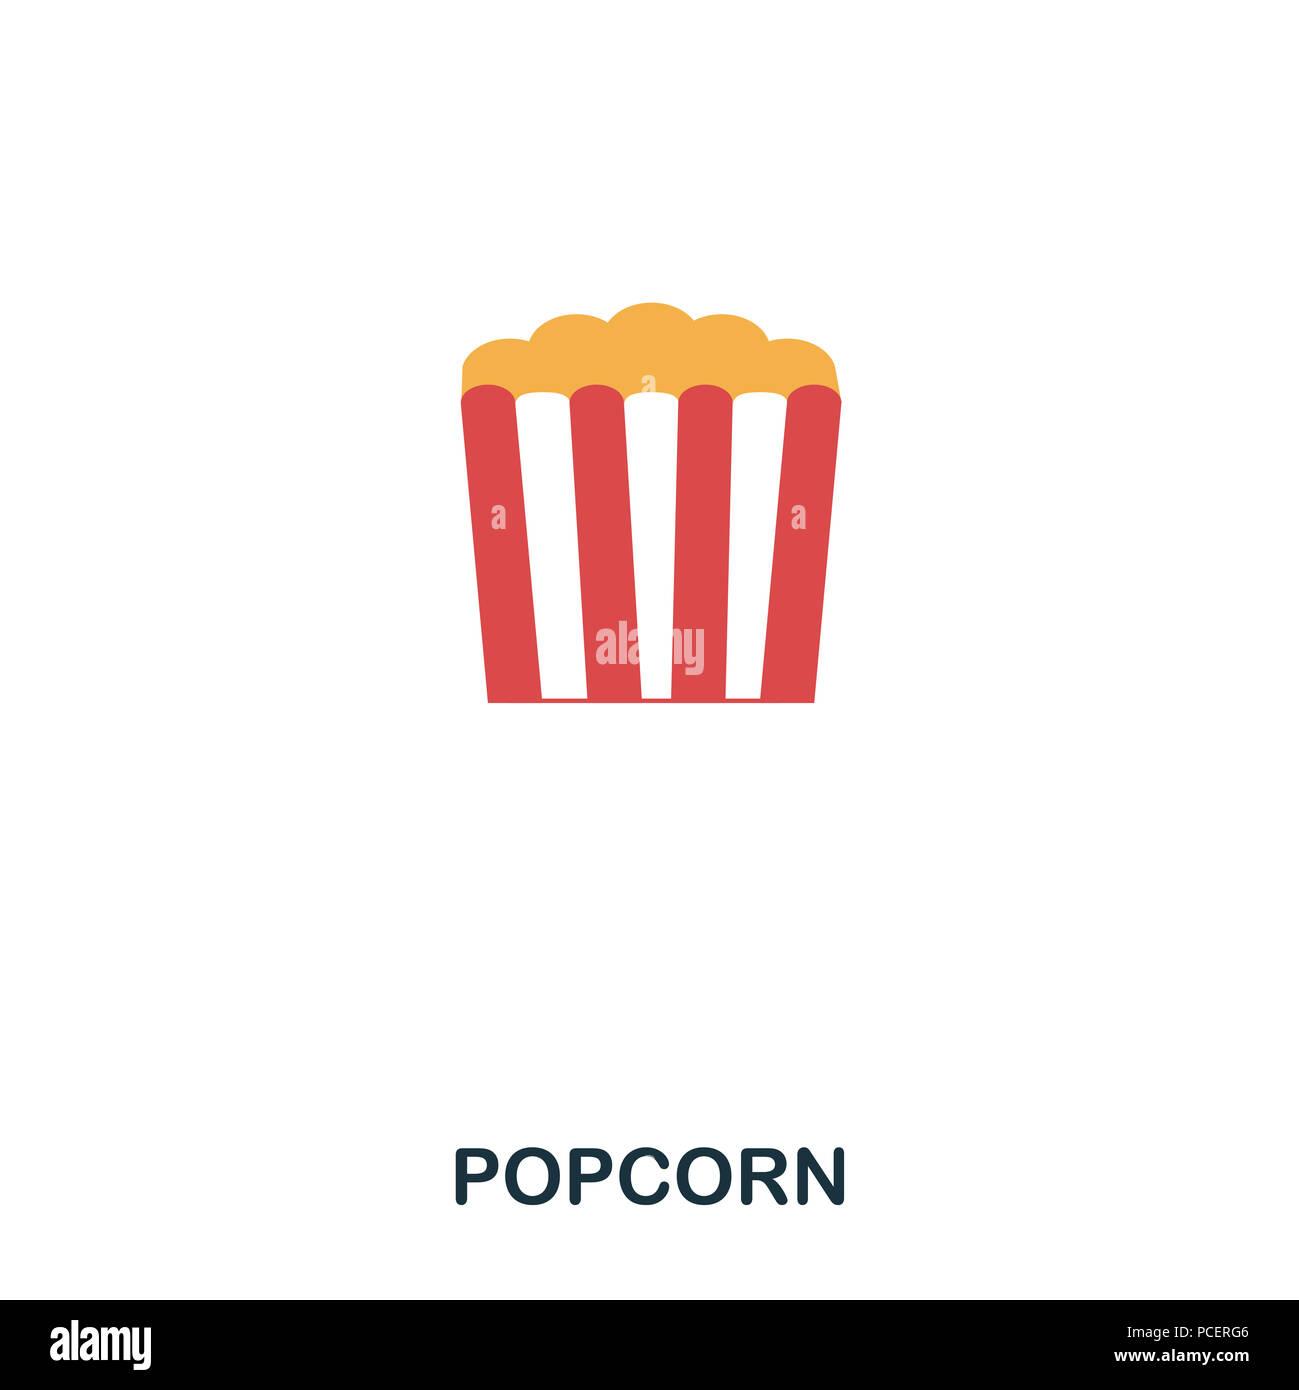 Cartoon Popcorn Stockfotos & Cartoon Popcorn Bilder - Alamy